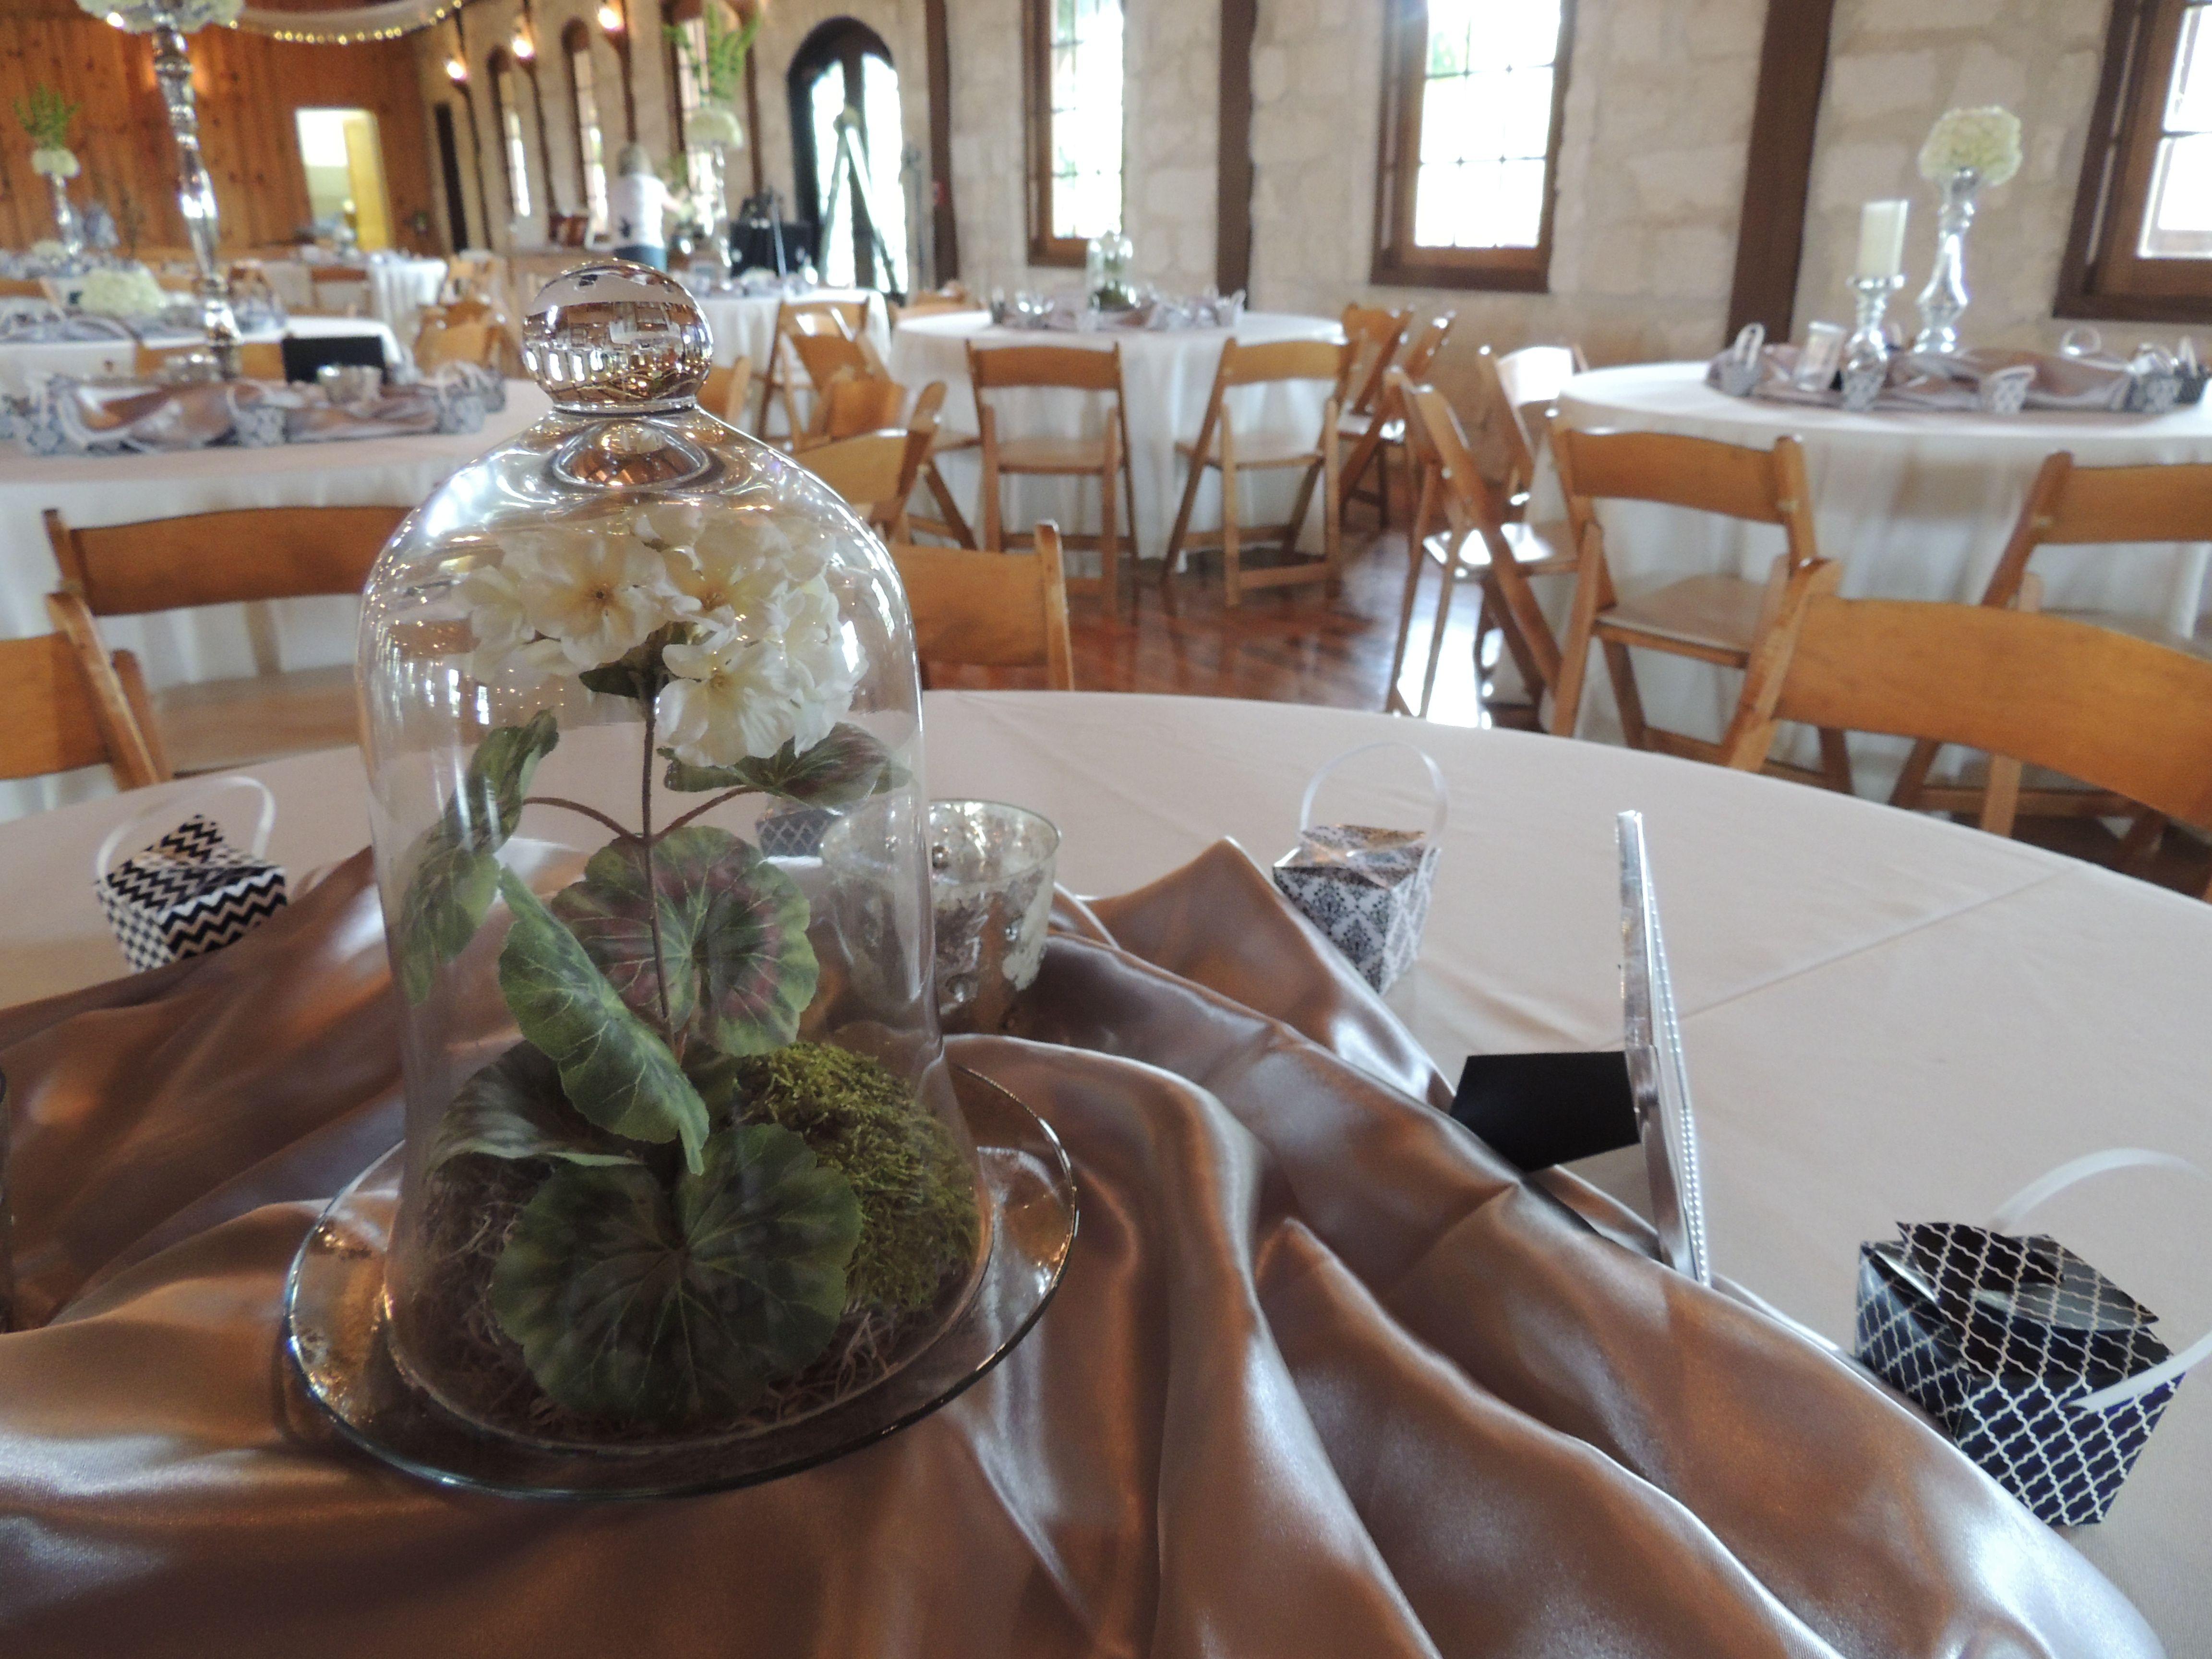 Centerpiece Tall Short Silver Vase Domed Flower Jar Lime Green